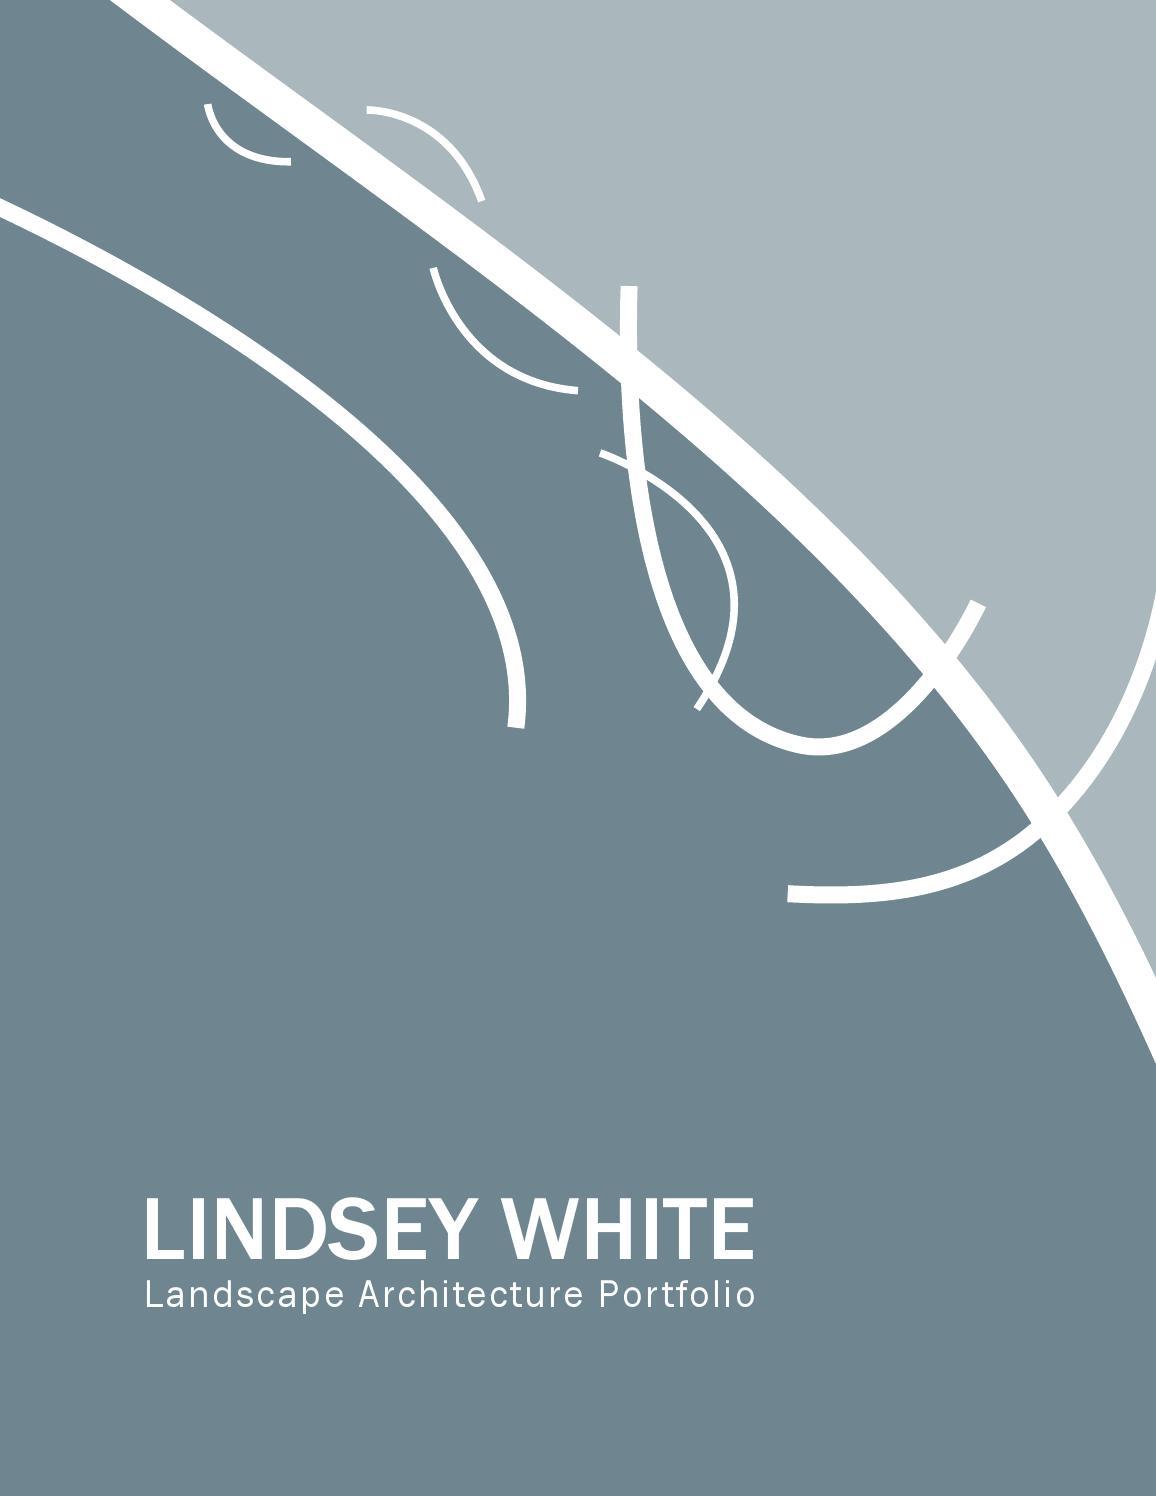 Landscape Architecture Portfolio : BLA 2016 By Lindsey White   Issuu